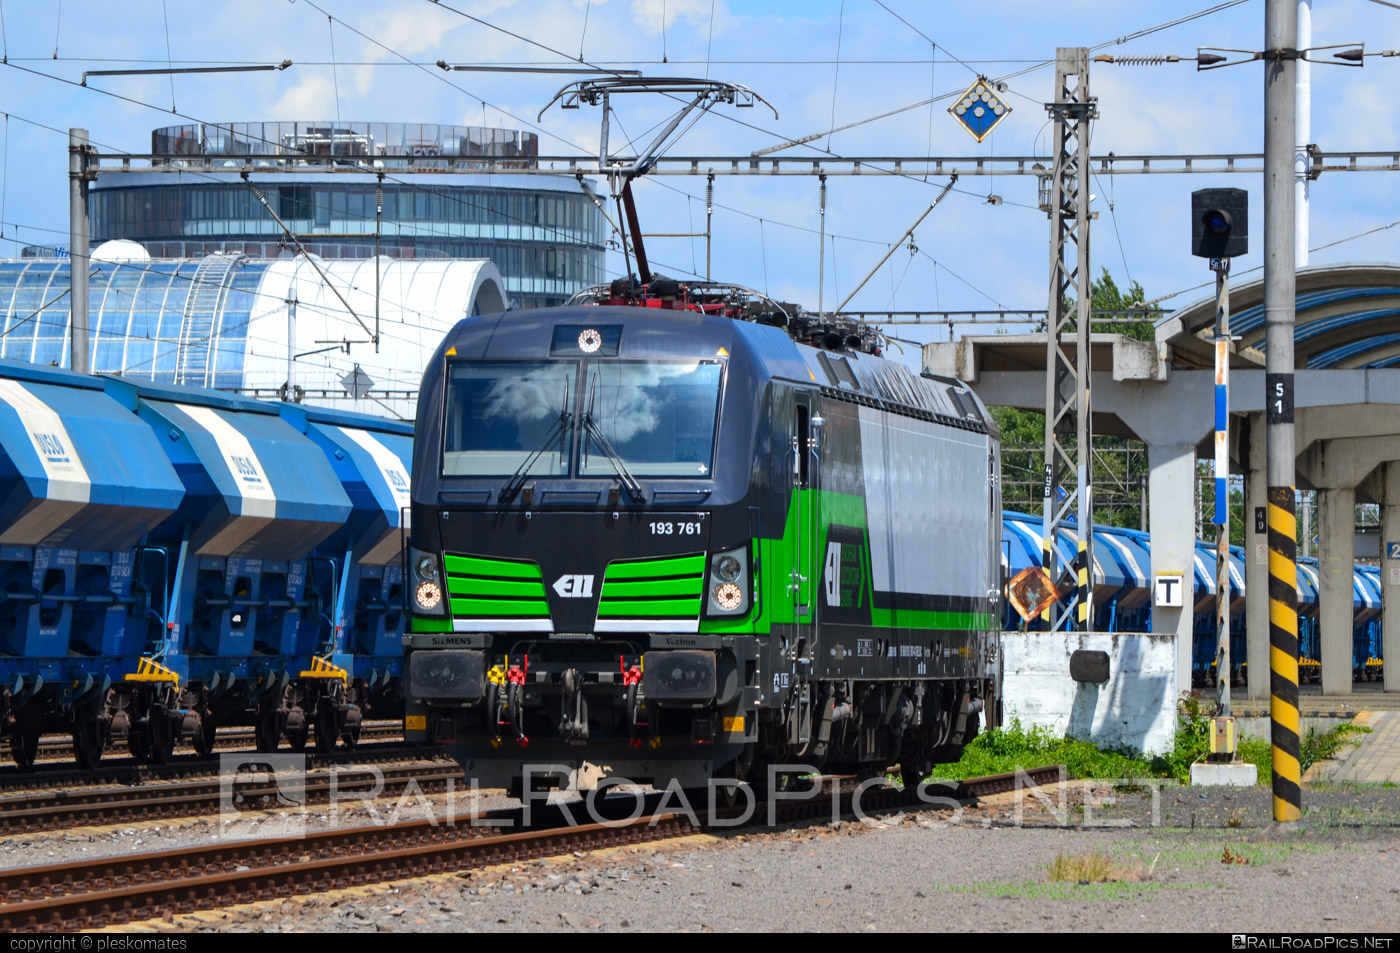 Siemens Vectron MS - 193 761 operated by Salzburger Eisenbahn Transportlogistik GmbH #SalzburgerEisenbahnTransportlogistik #SalzburgerEisenbahnTransportlogistikGmbH #ell #ellgermany #eloc #europeanlocomotiveleasing #setg #siemens #siemensvectron #siemensvectronms #vectron #vectronms